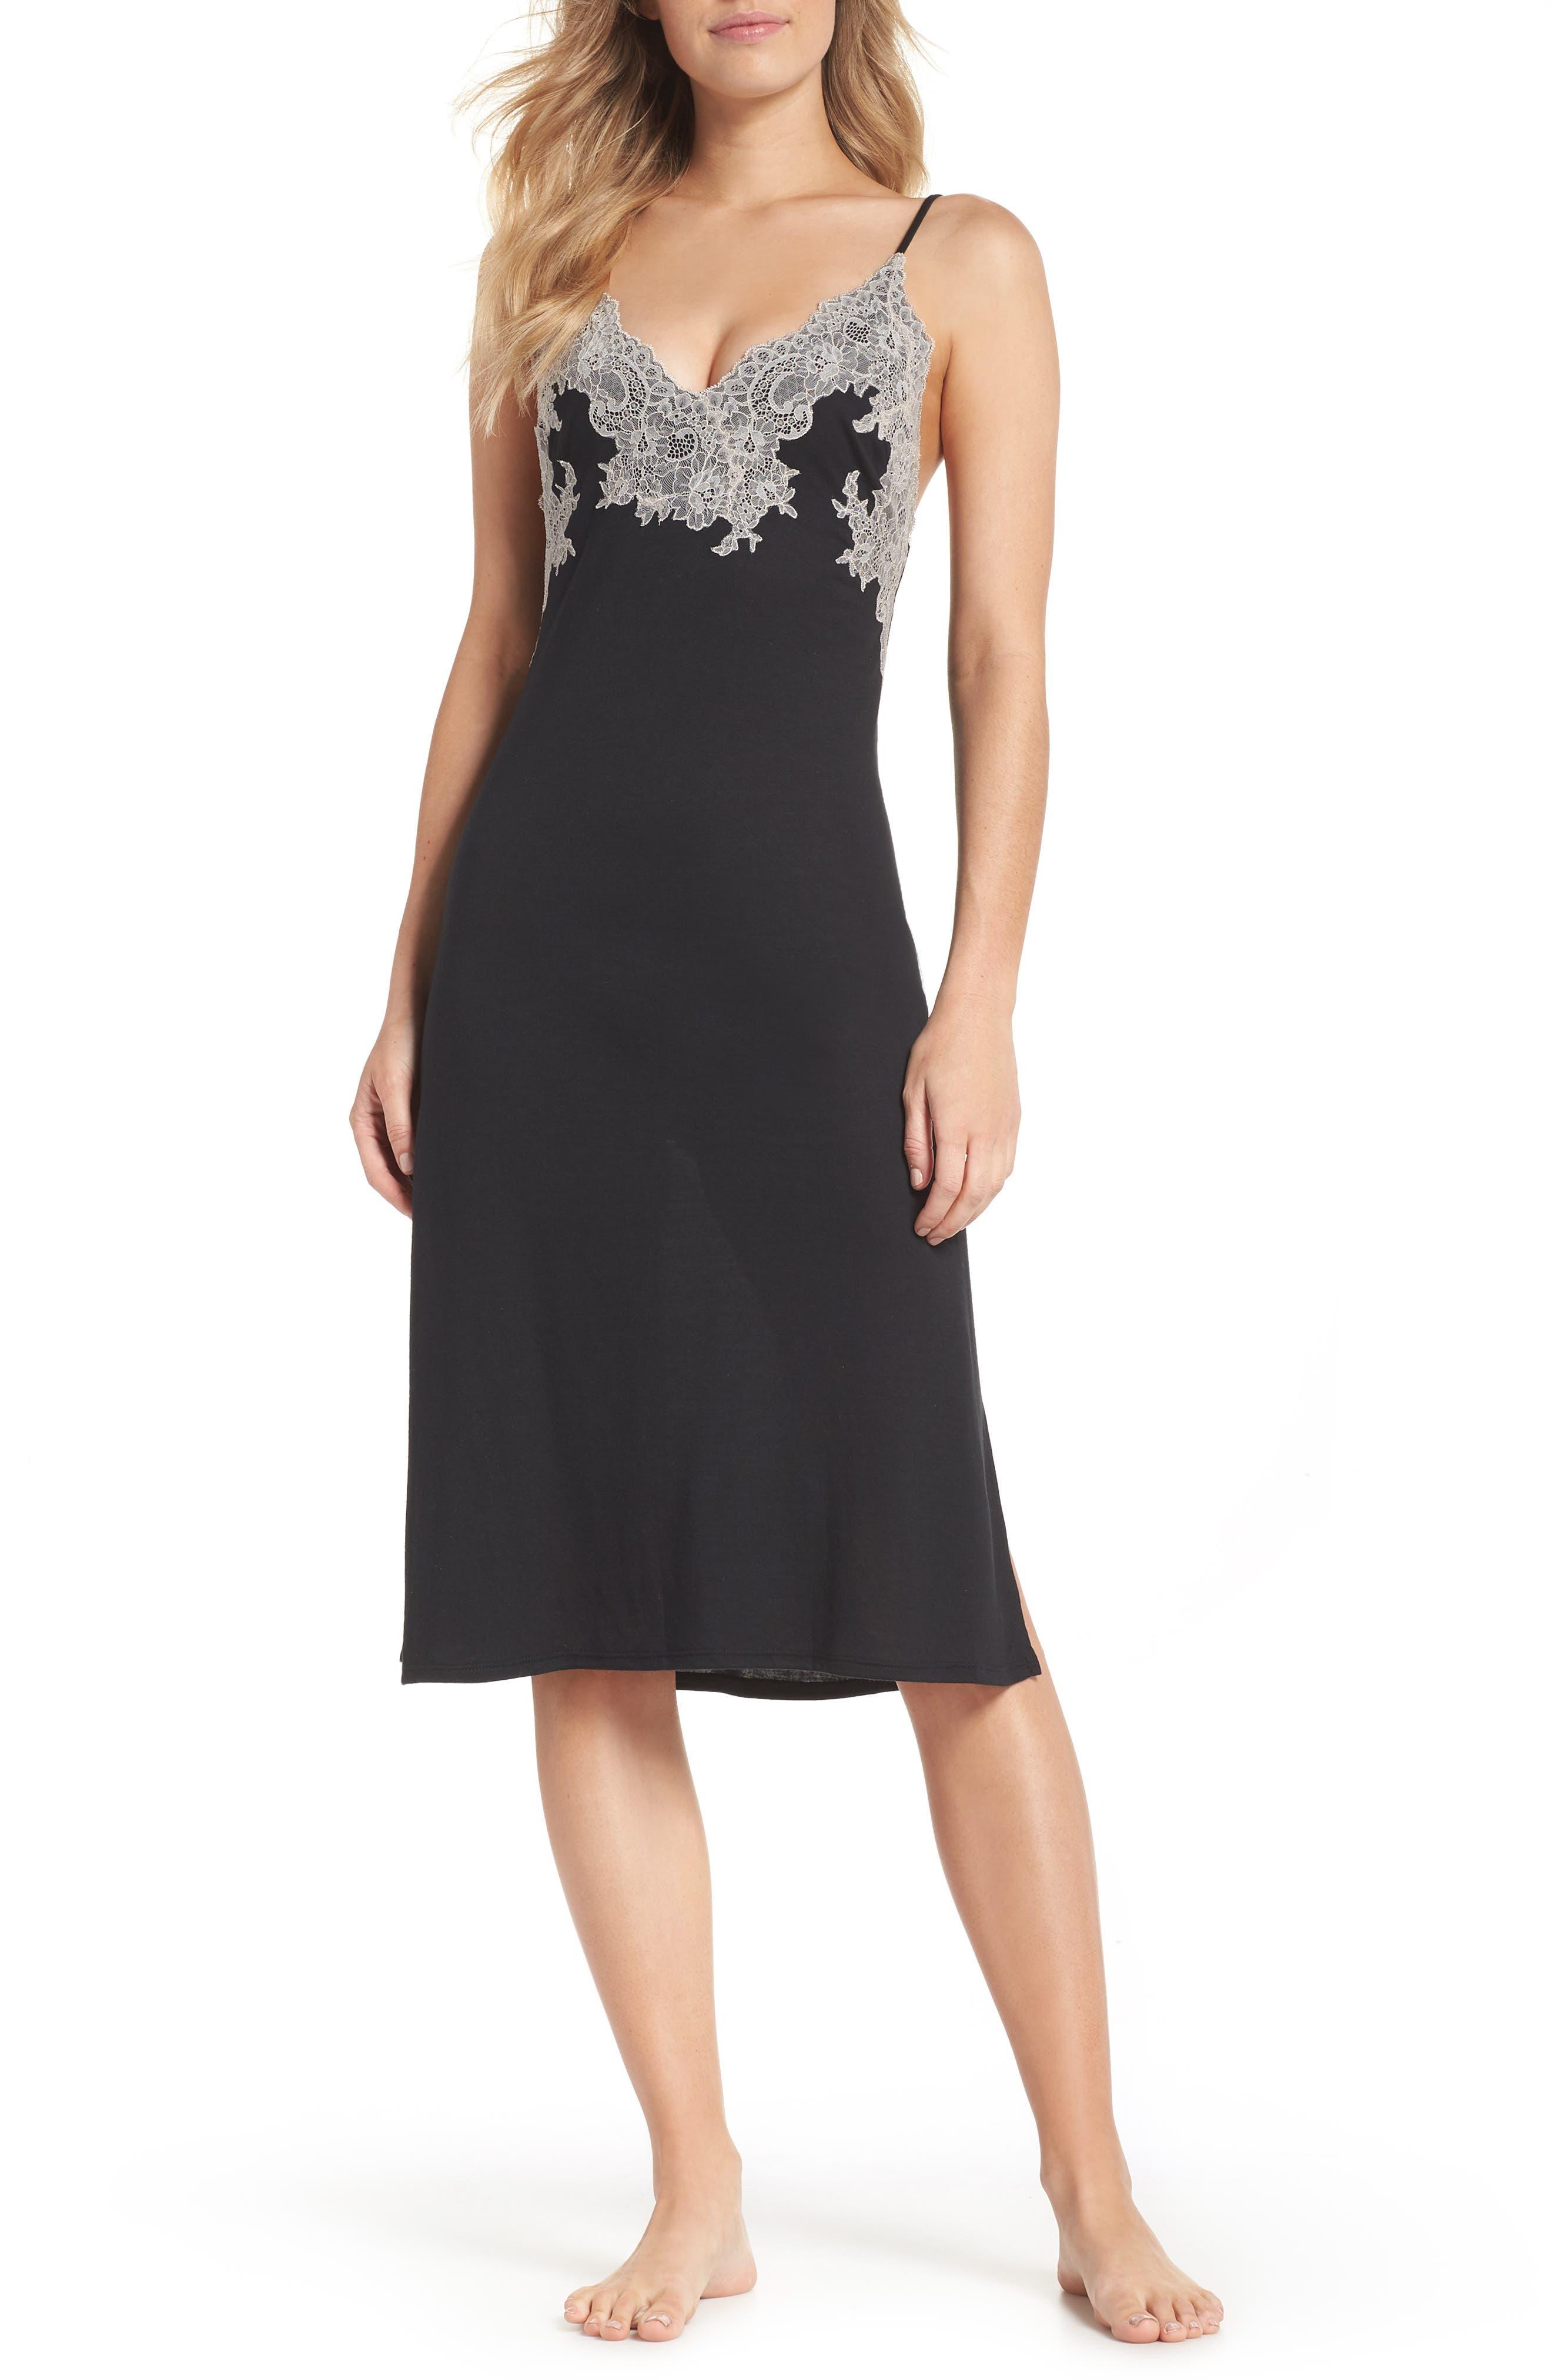 NATORI, Luxe Shangri-La Nightgown, Main thumbnail 1, color, BLACK